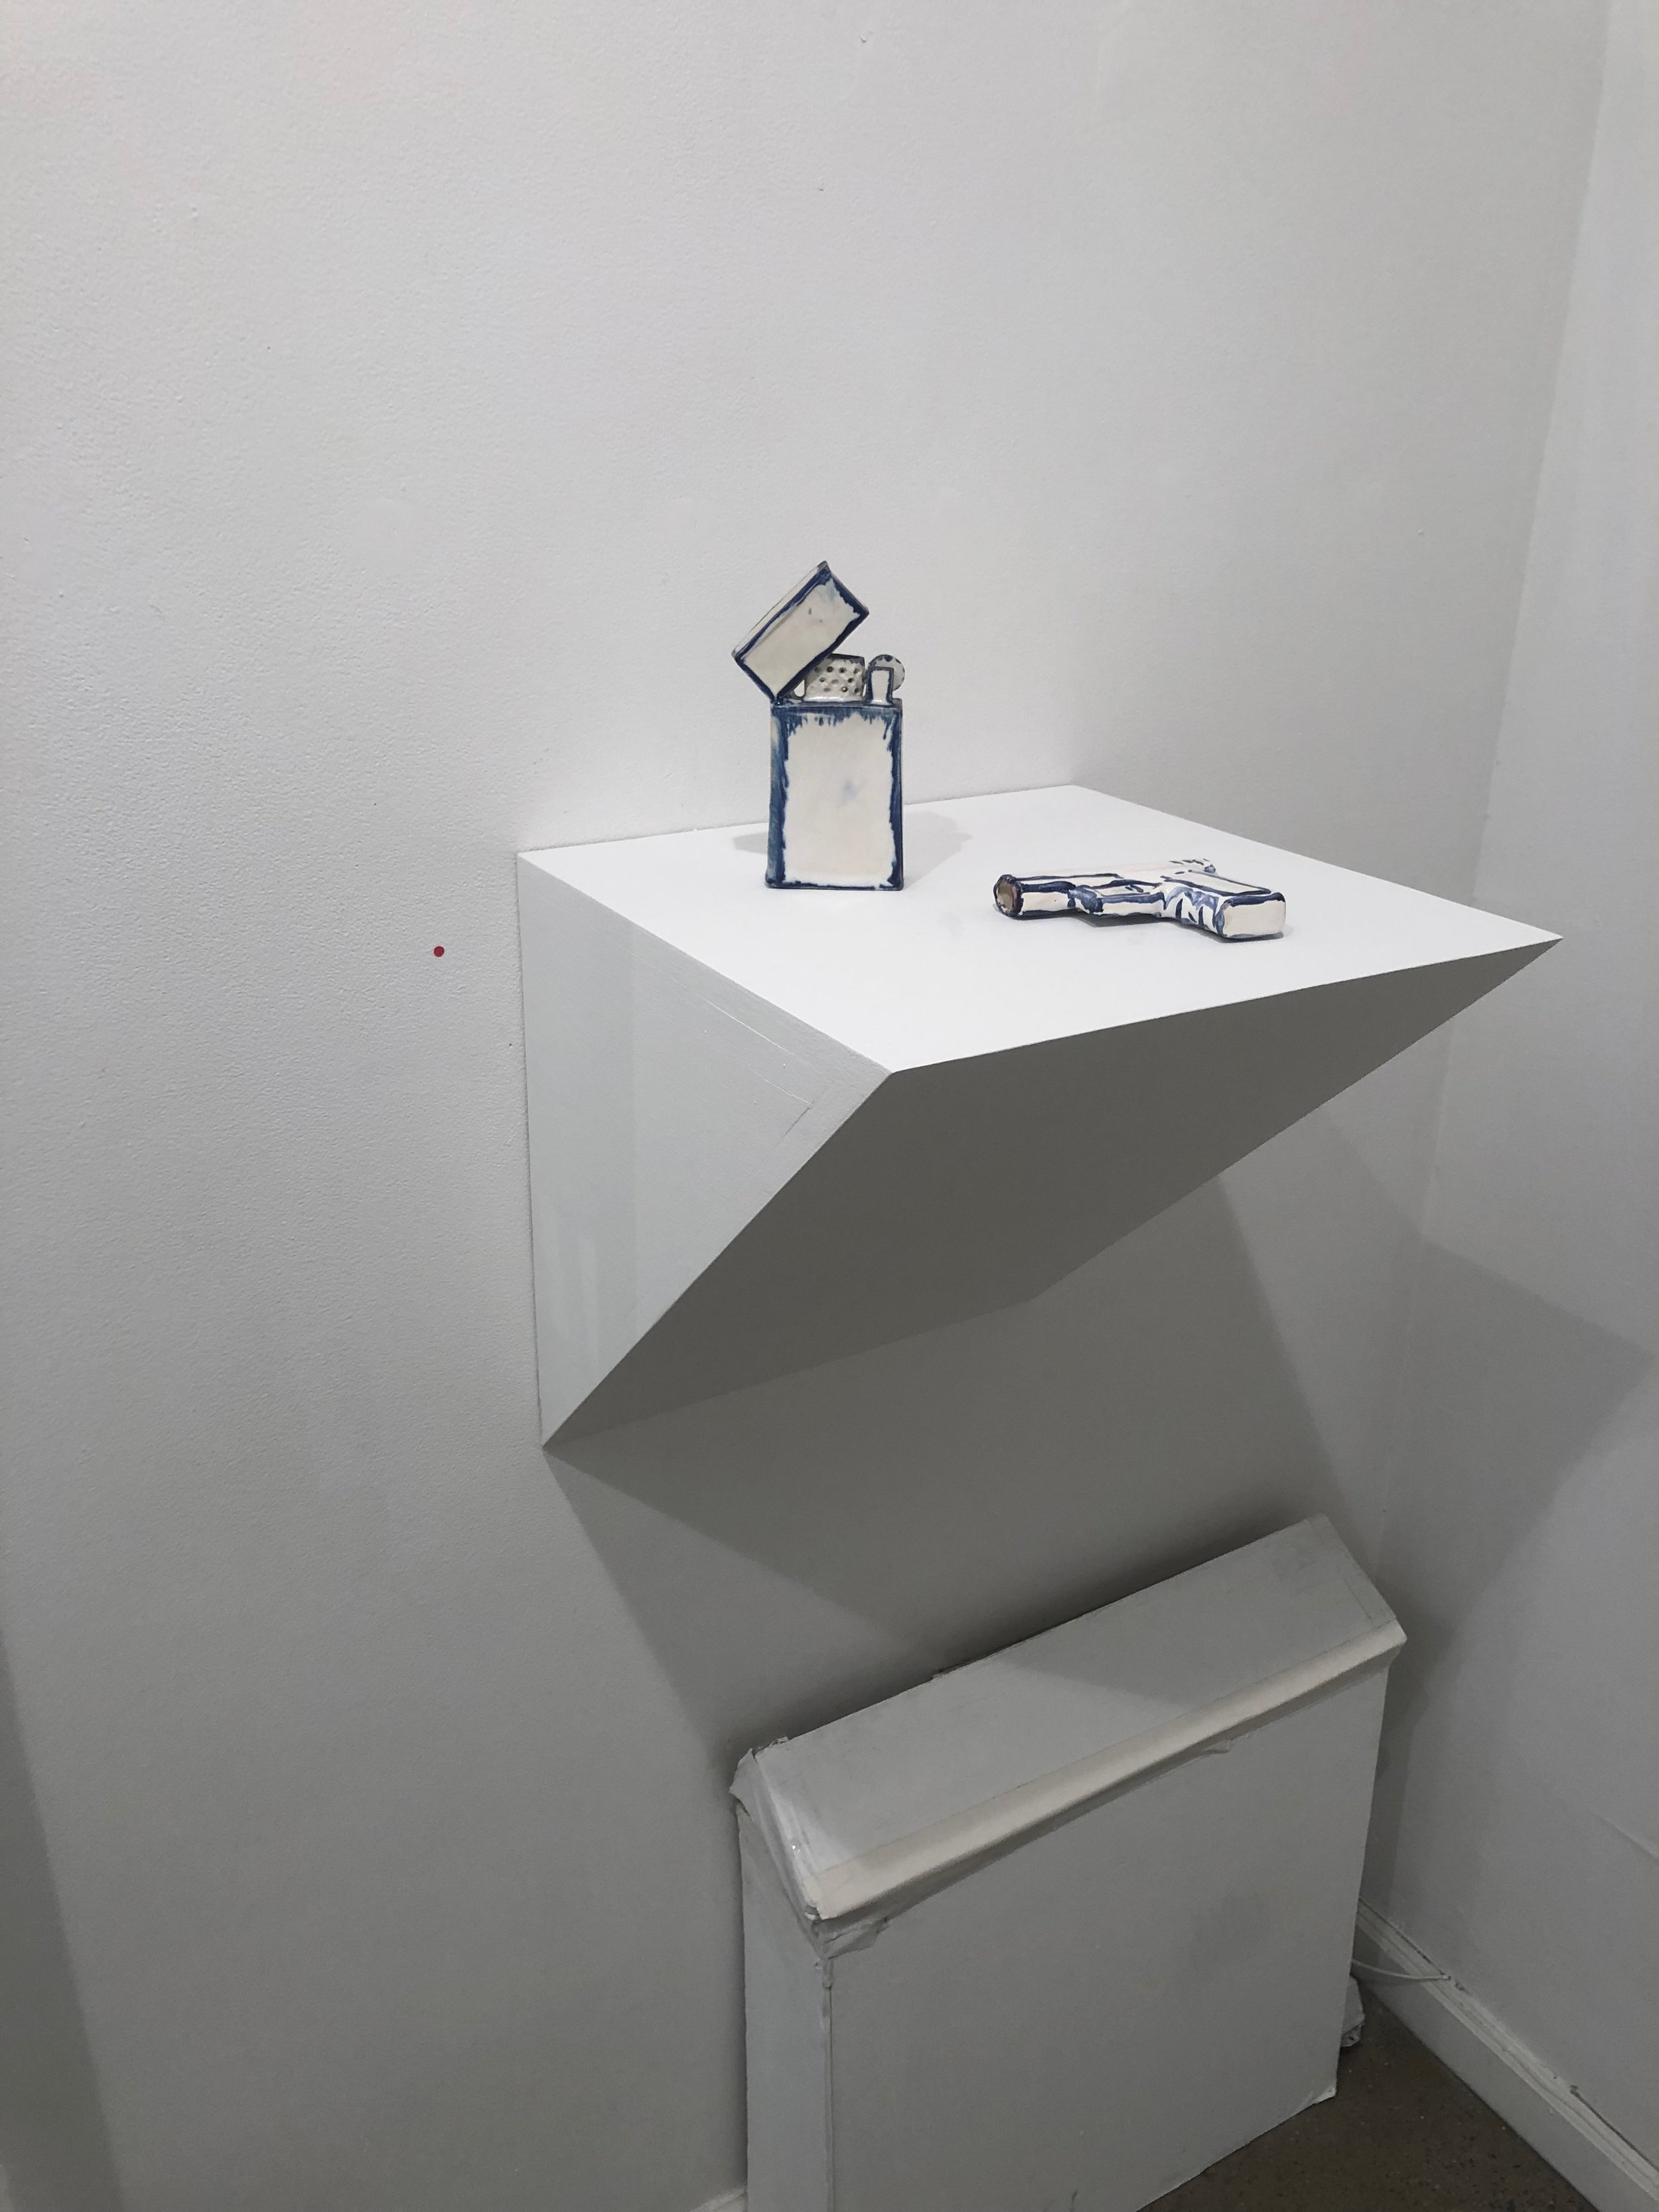 Installation Photo of Hard-Line